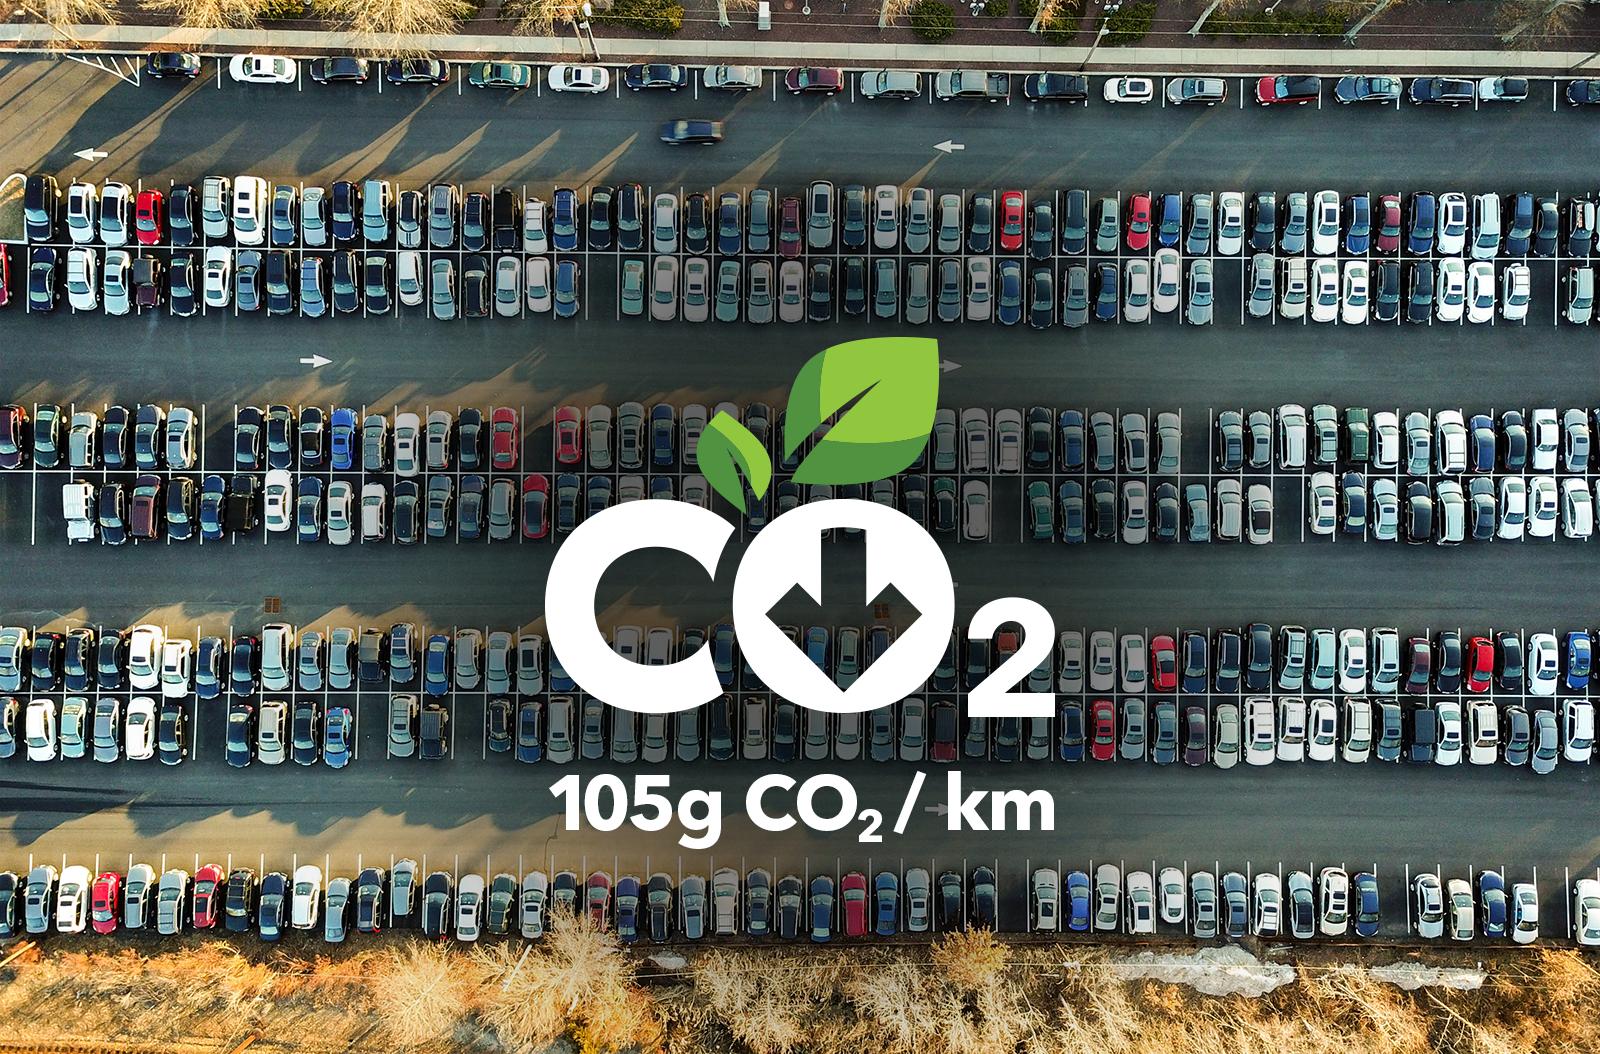 Nastavujeme si vlastné emisné limity